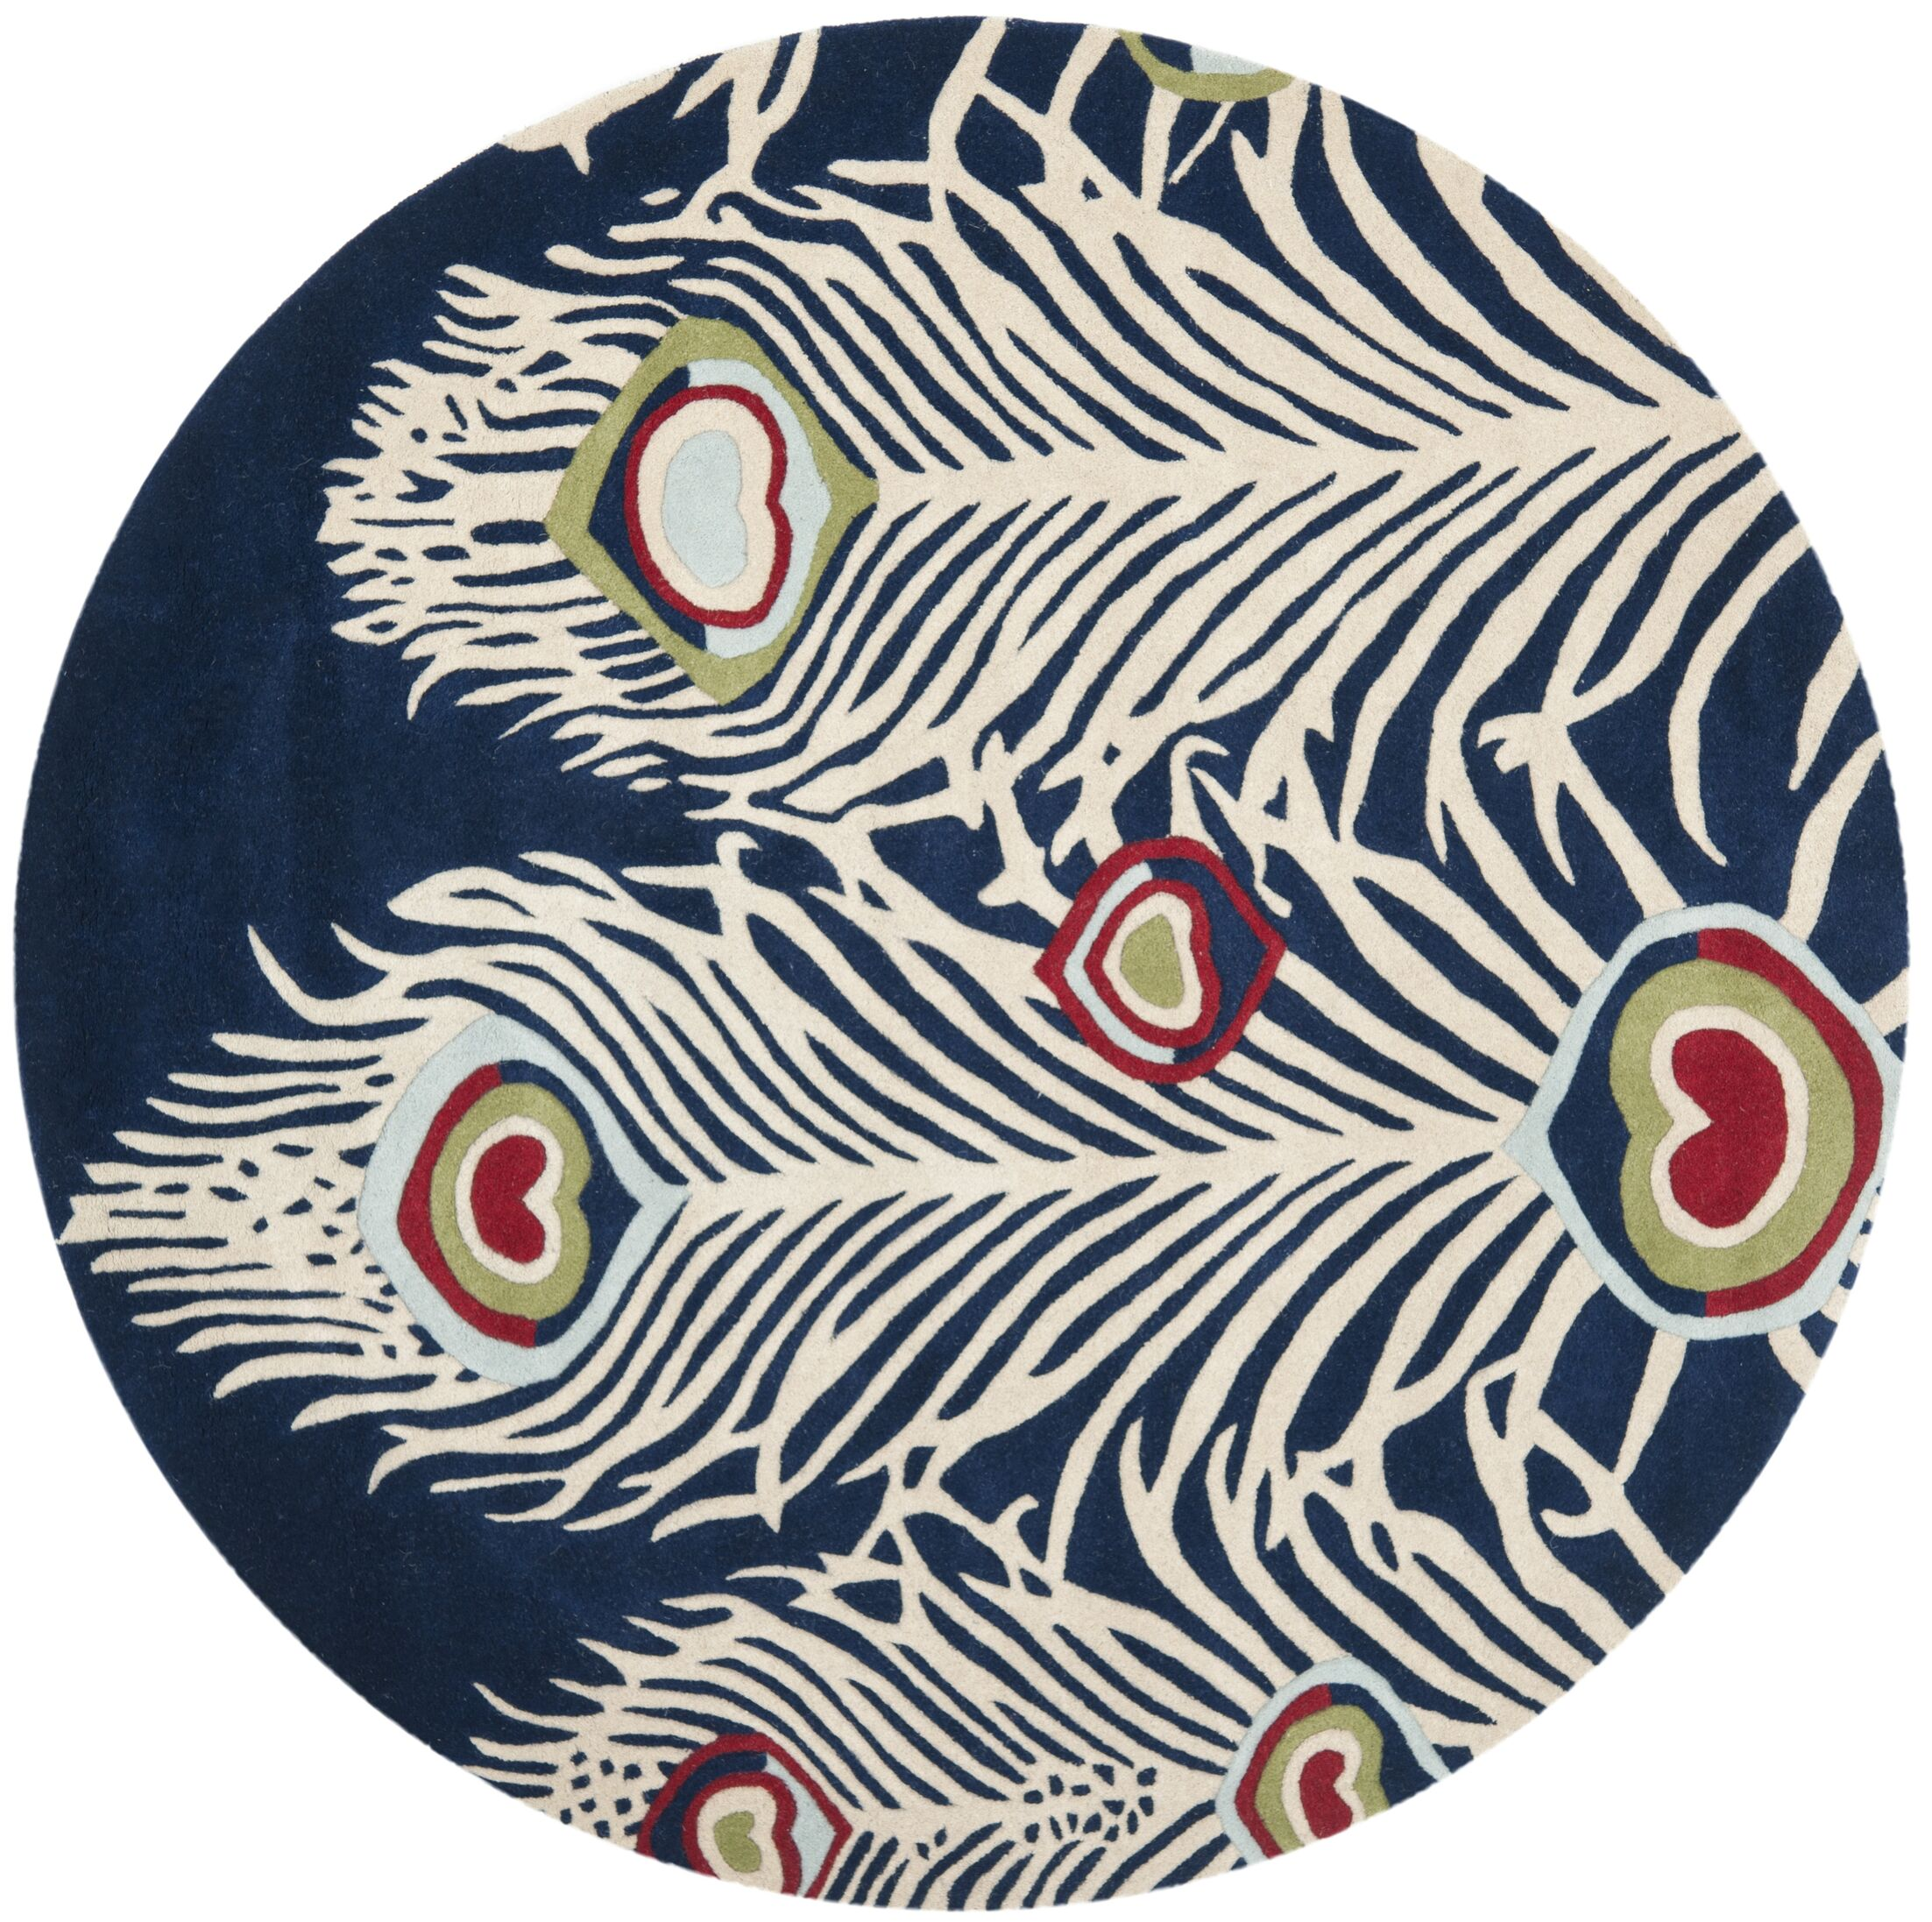 Dorthy Blue/Ivory Rug Rug Size: Round 6' x 6'